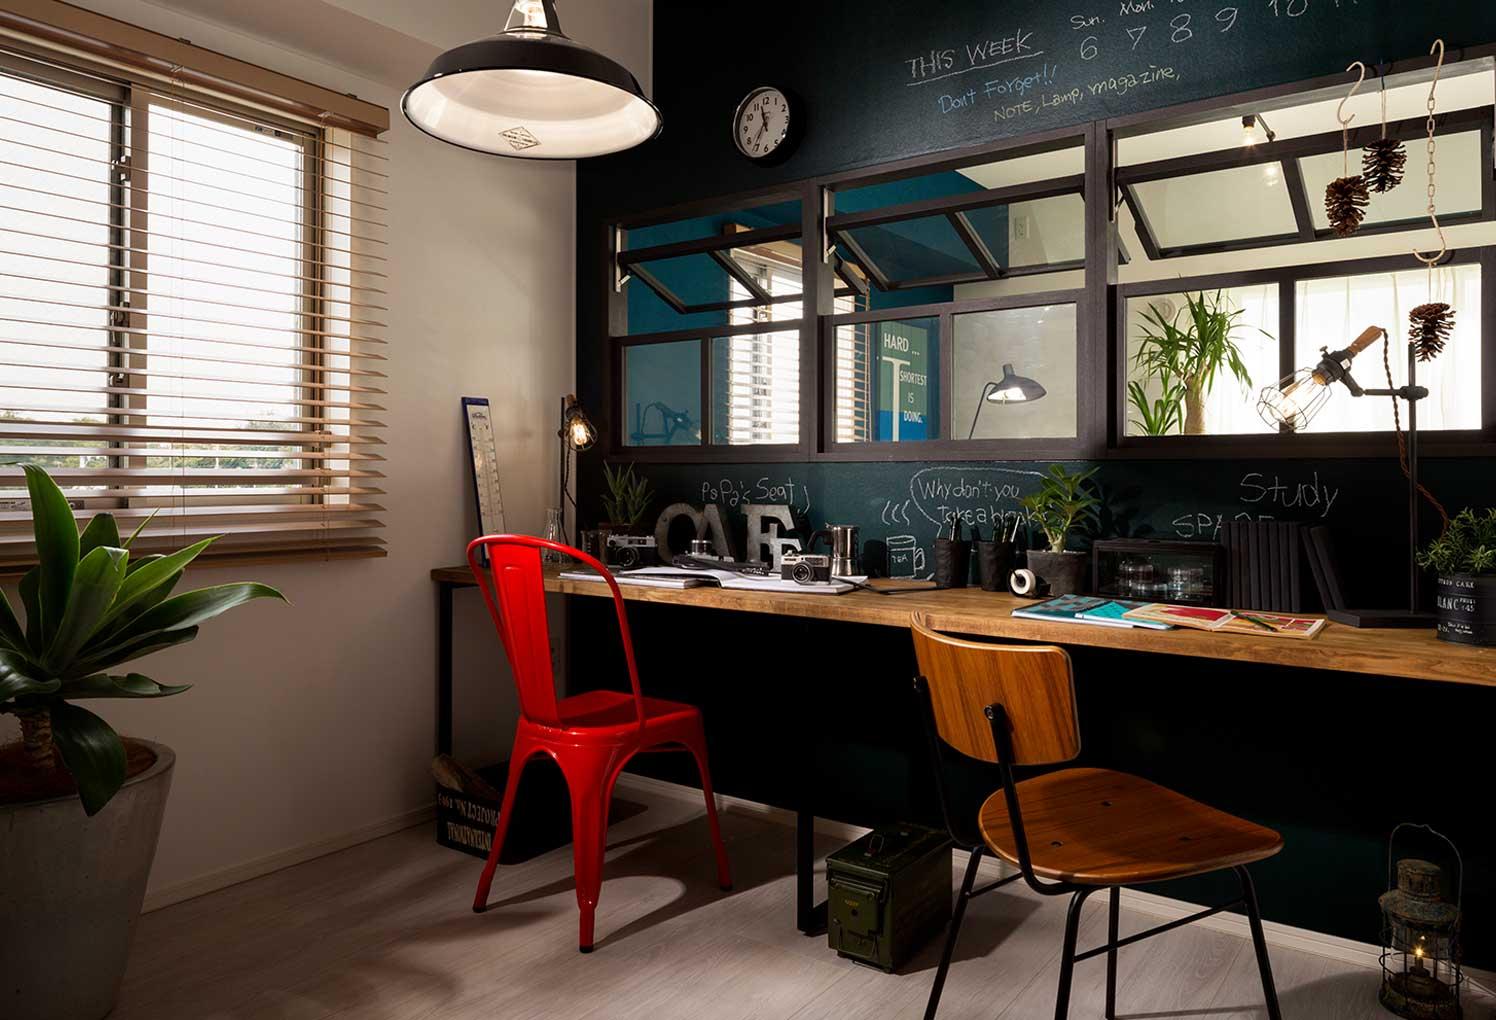 solfiesta tsukimino matsuda design studio. Black Bedroom Furniture Sets. Home Design Ideas